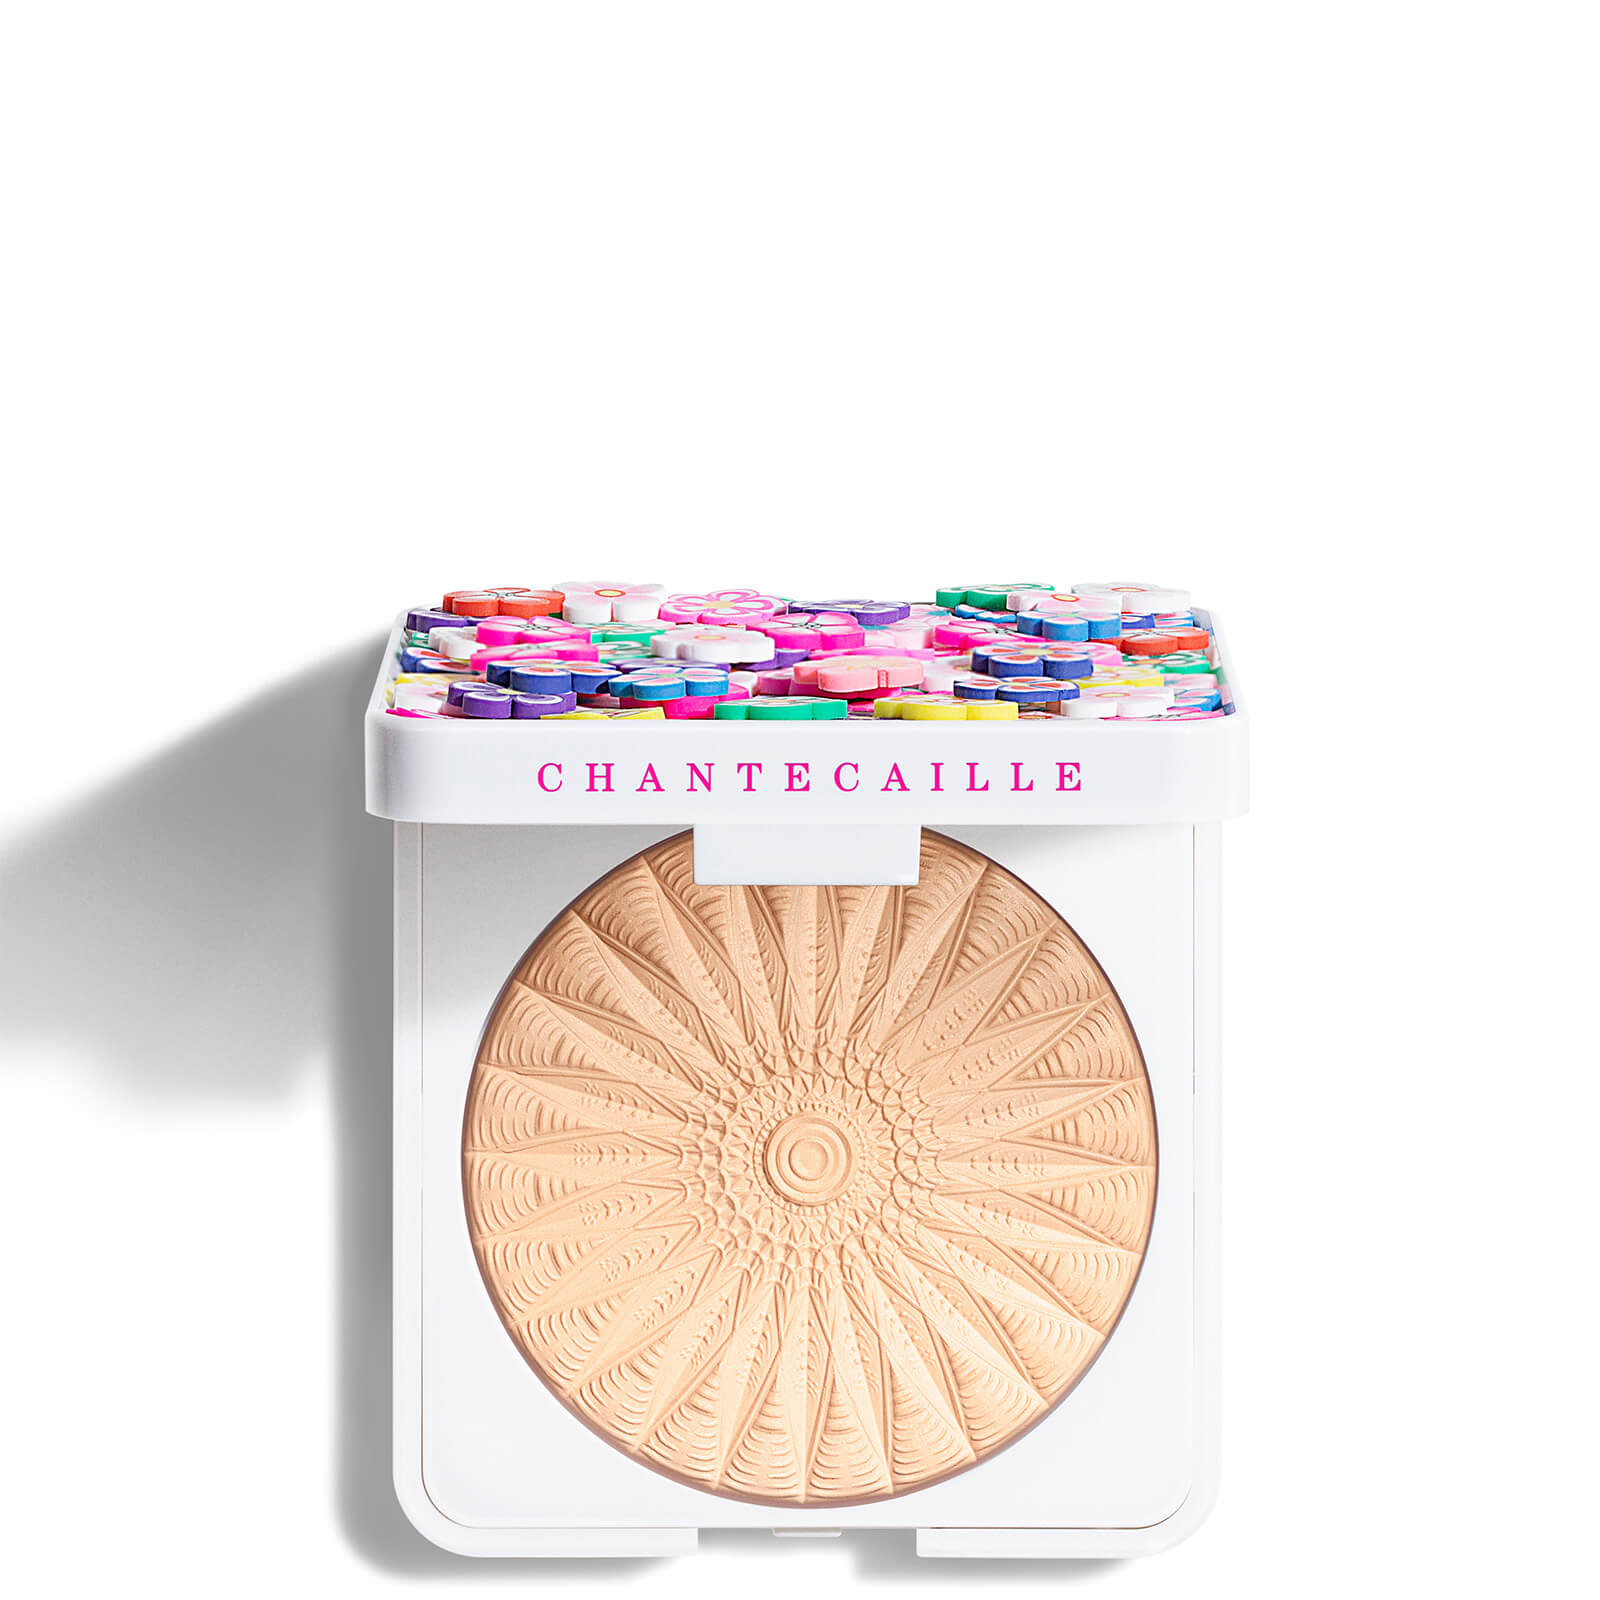 Chantecaille Flower Power Perfect Blur Finishing Powder - Light-Medium 8g